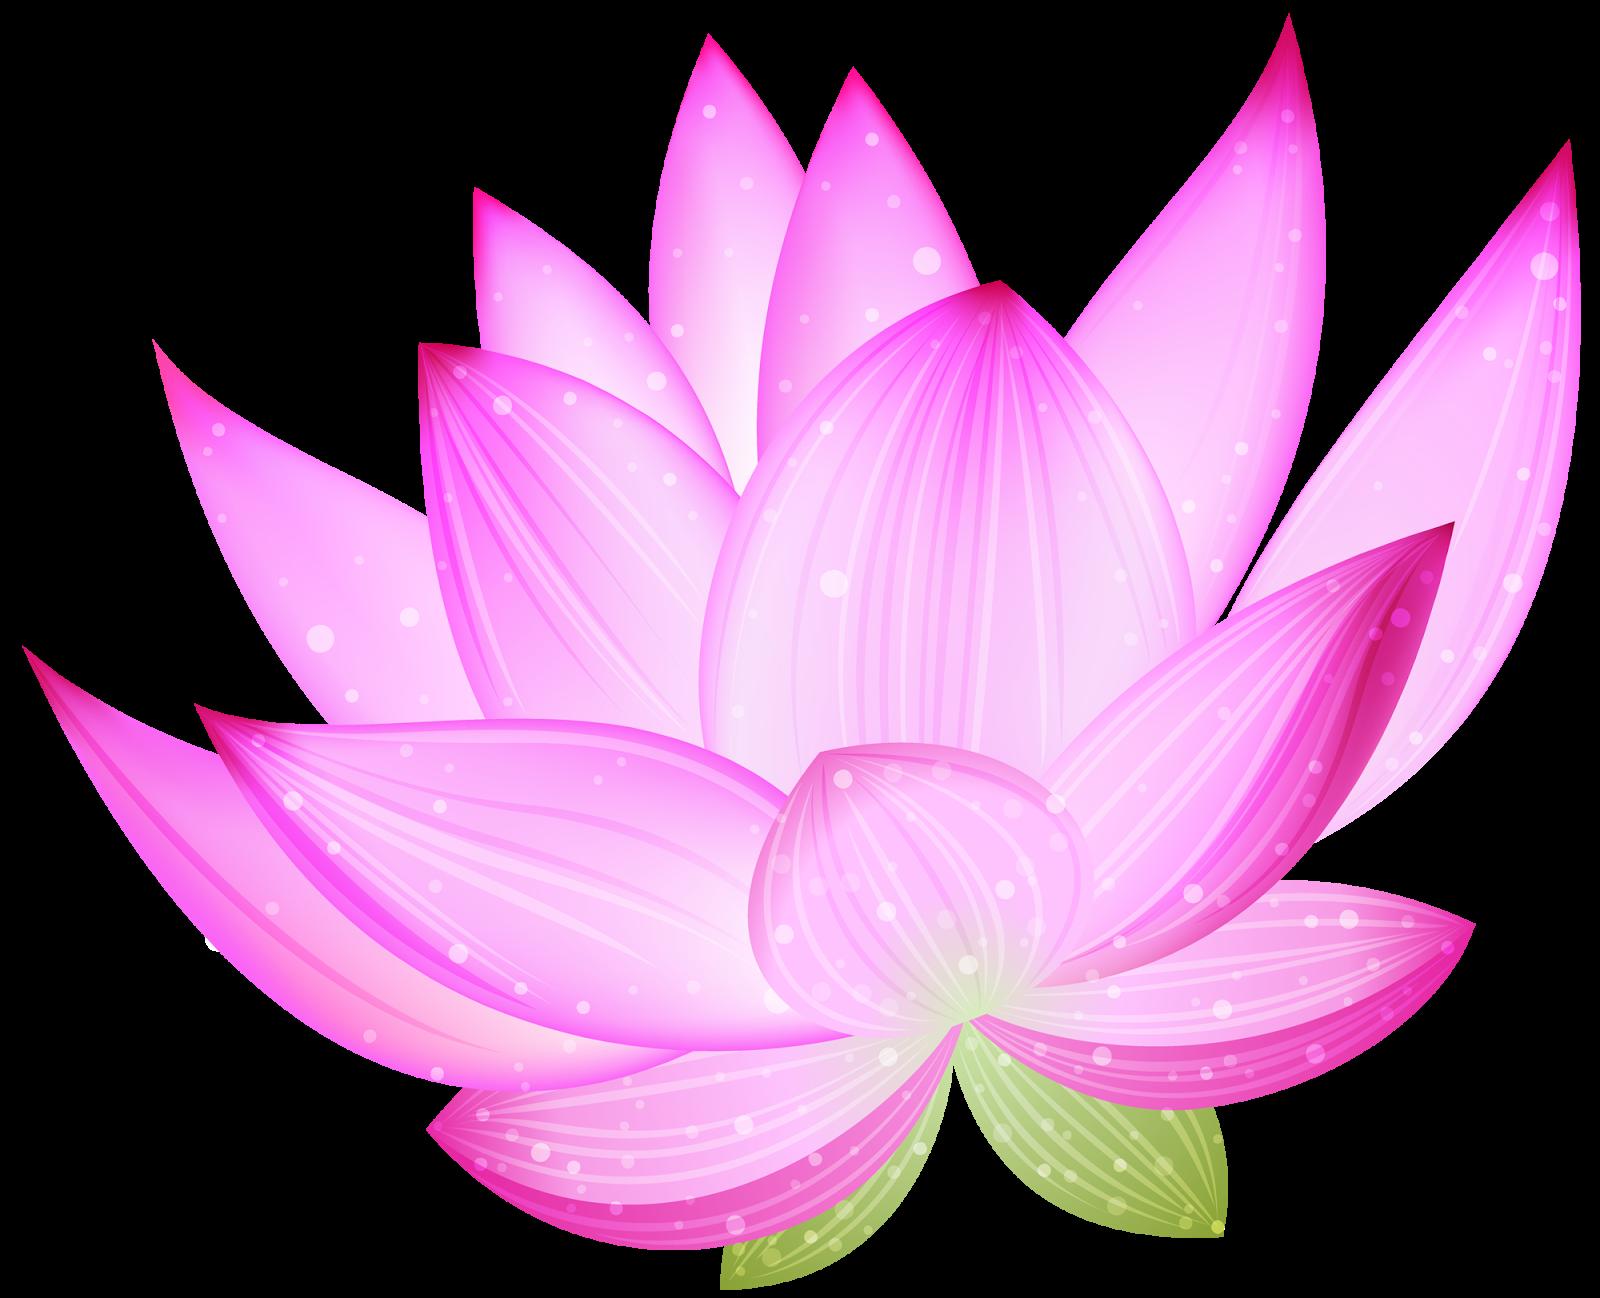 Lotus clipart chakra. Png flores pesquisa google